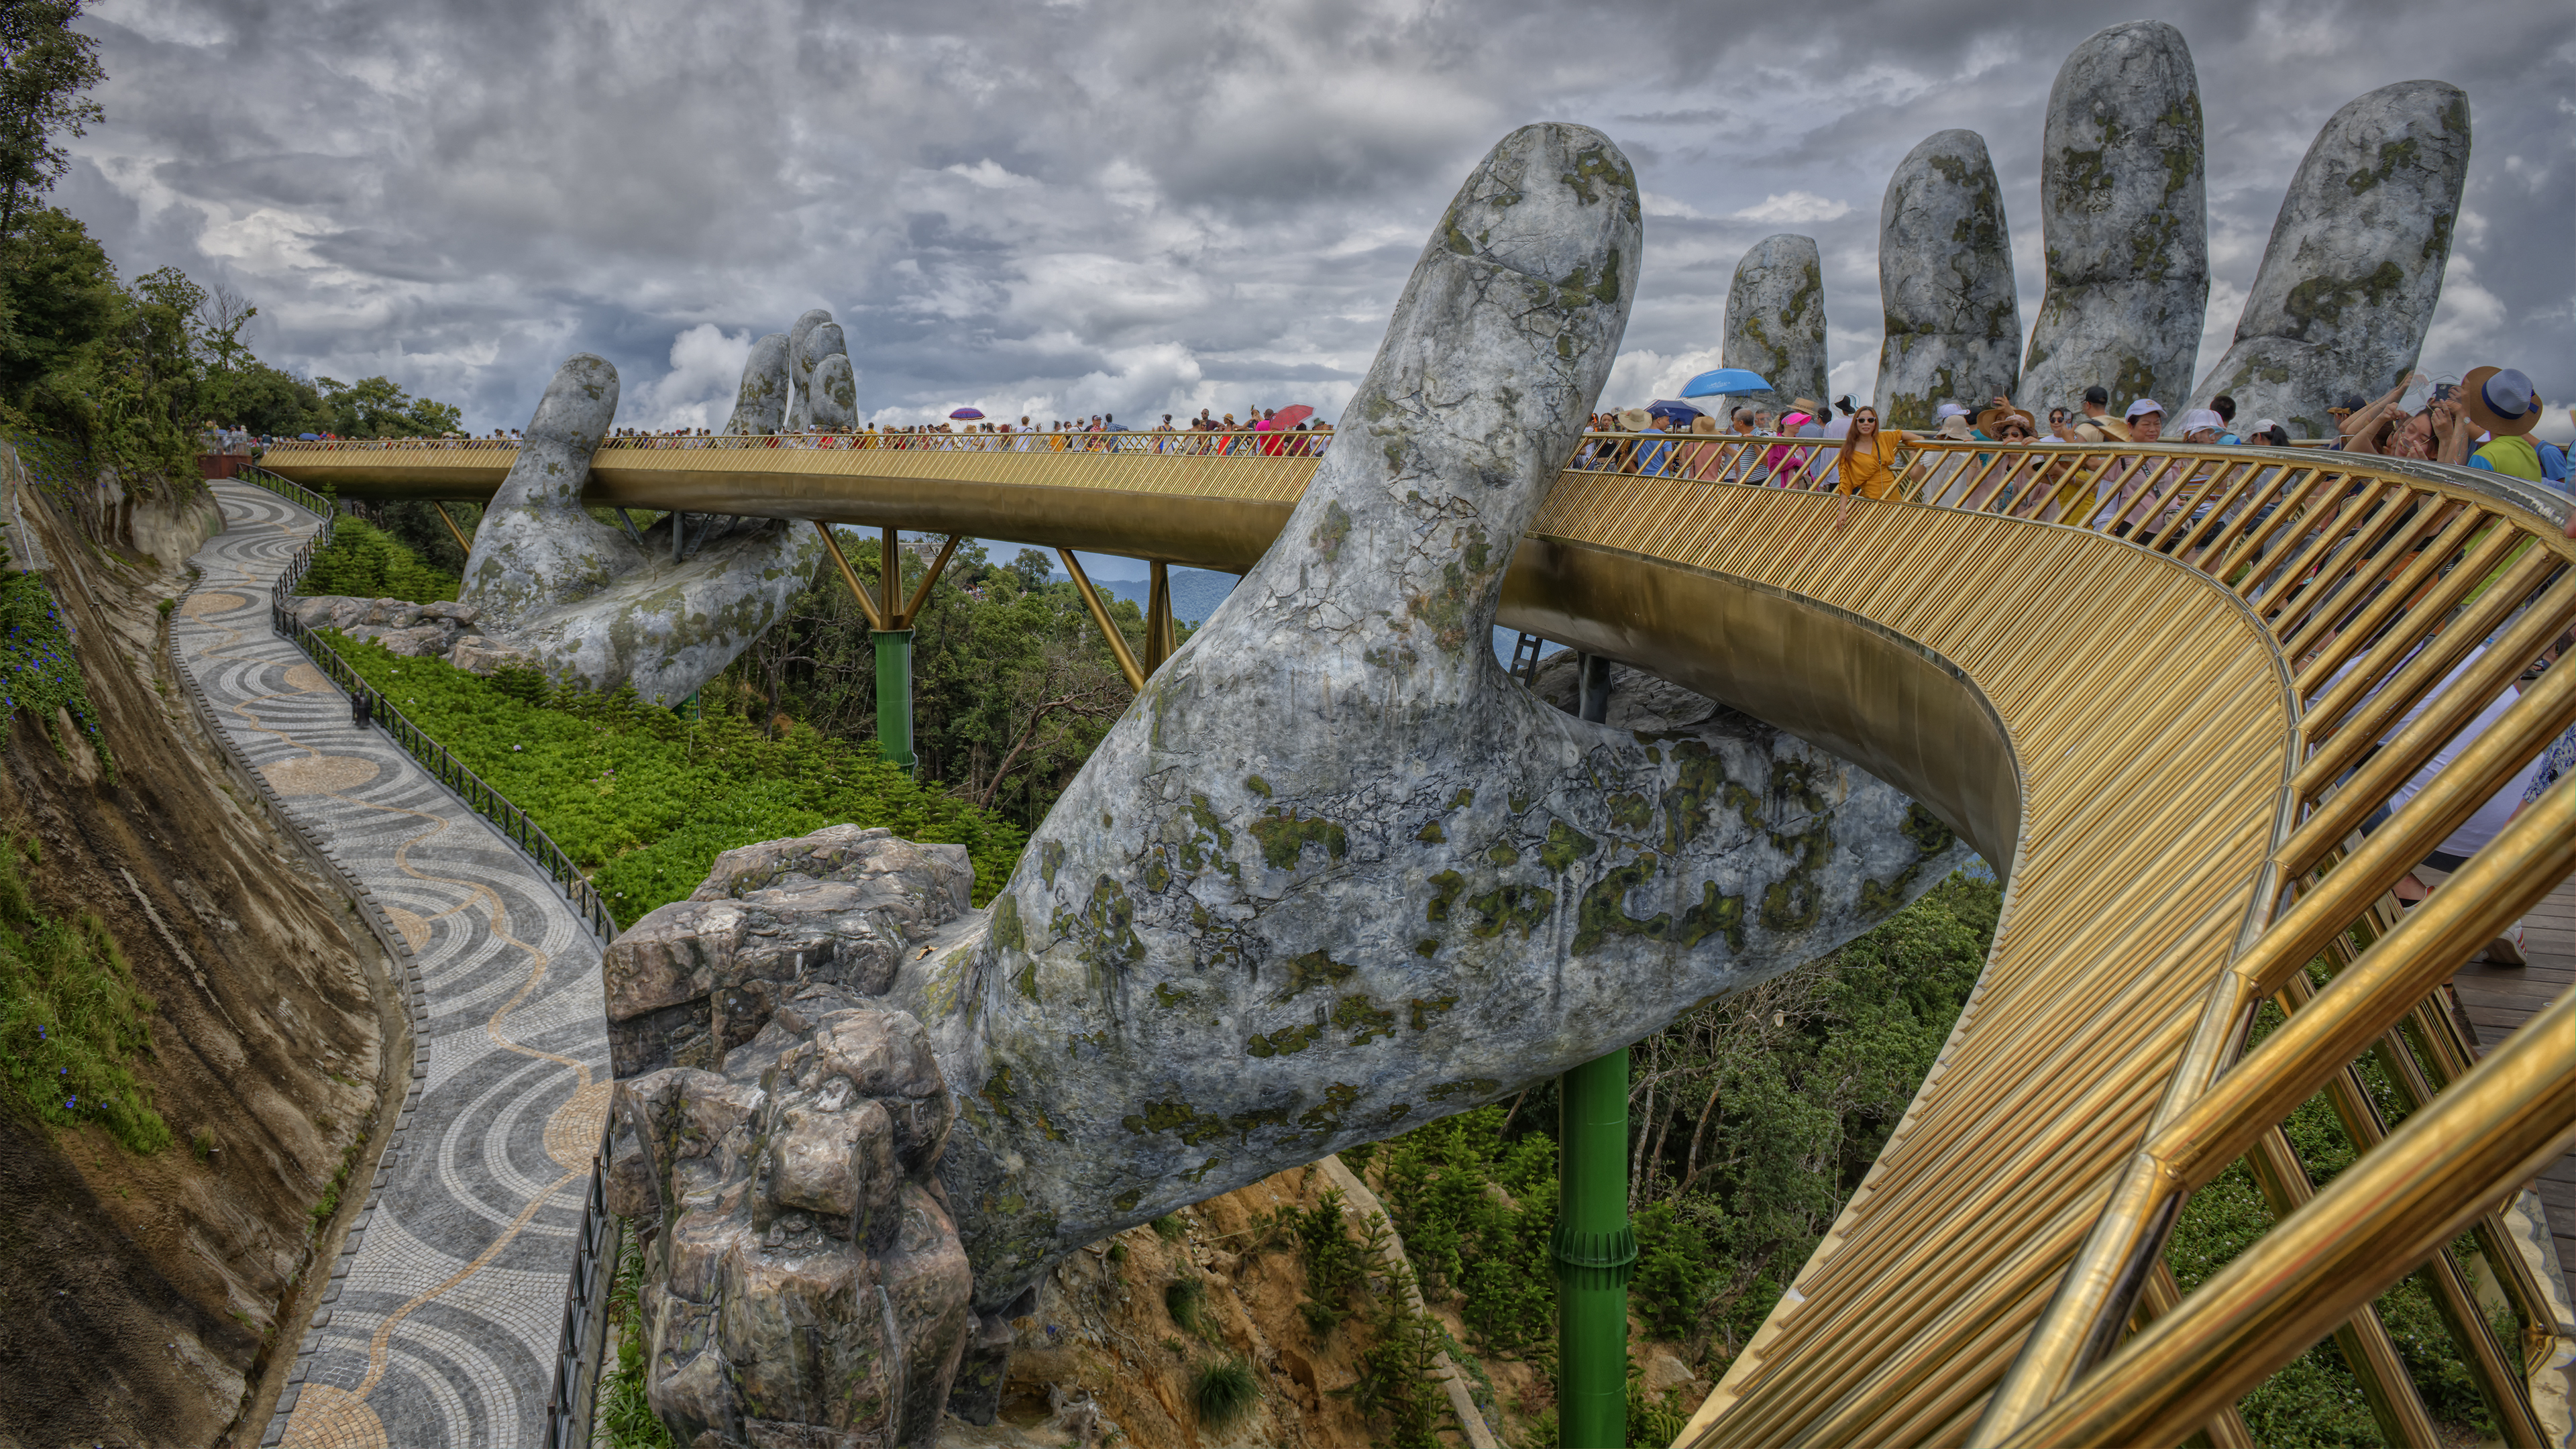 The Golden Bridge in Da Nang